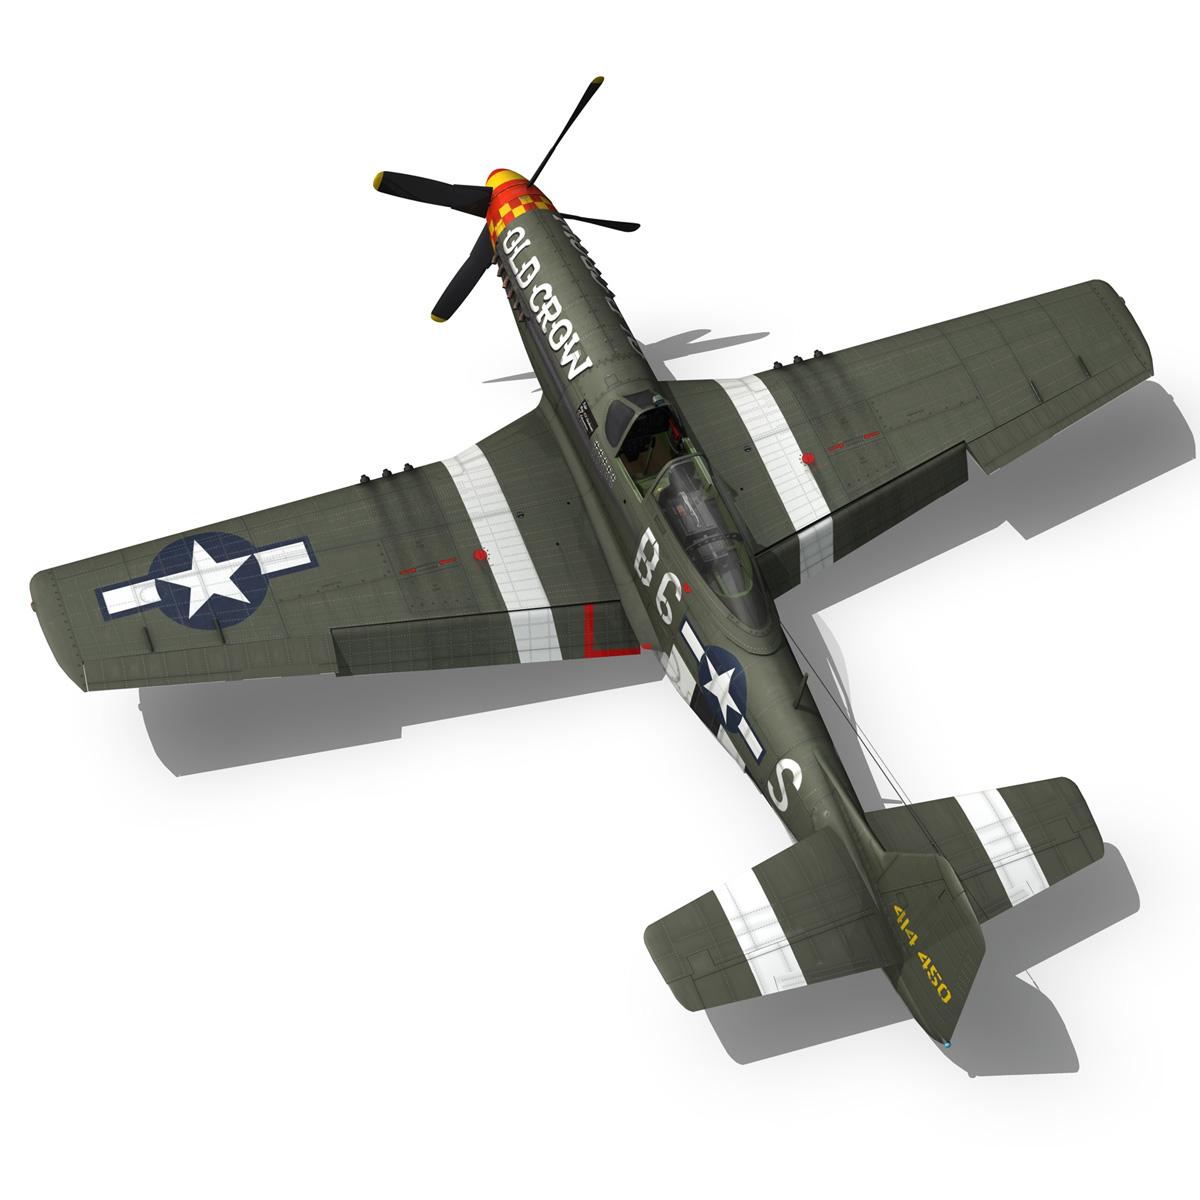 north american p-51d mustang – old crow 3d model fbx c4d lwo obj 273344